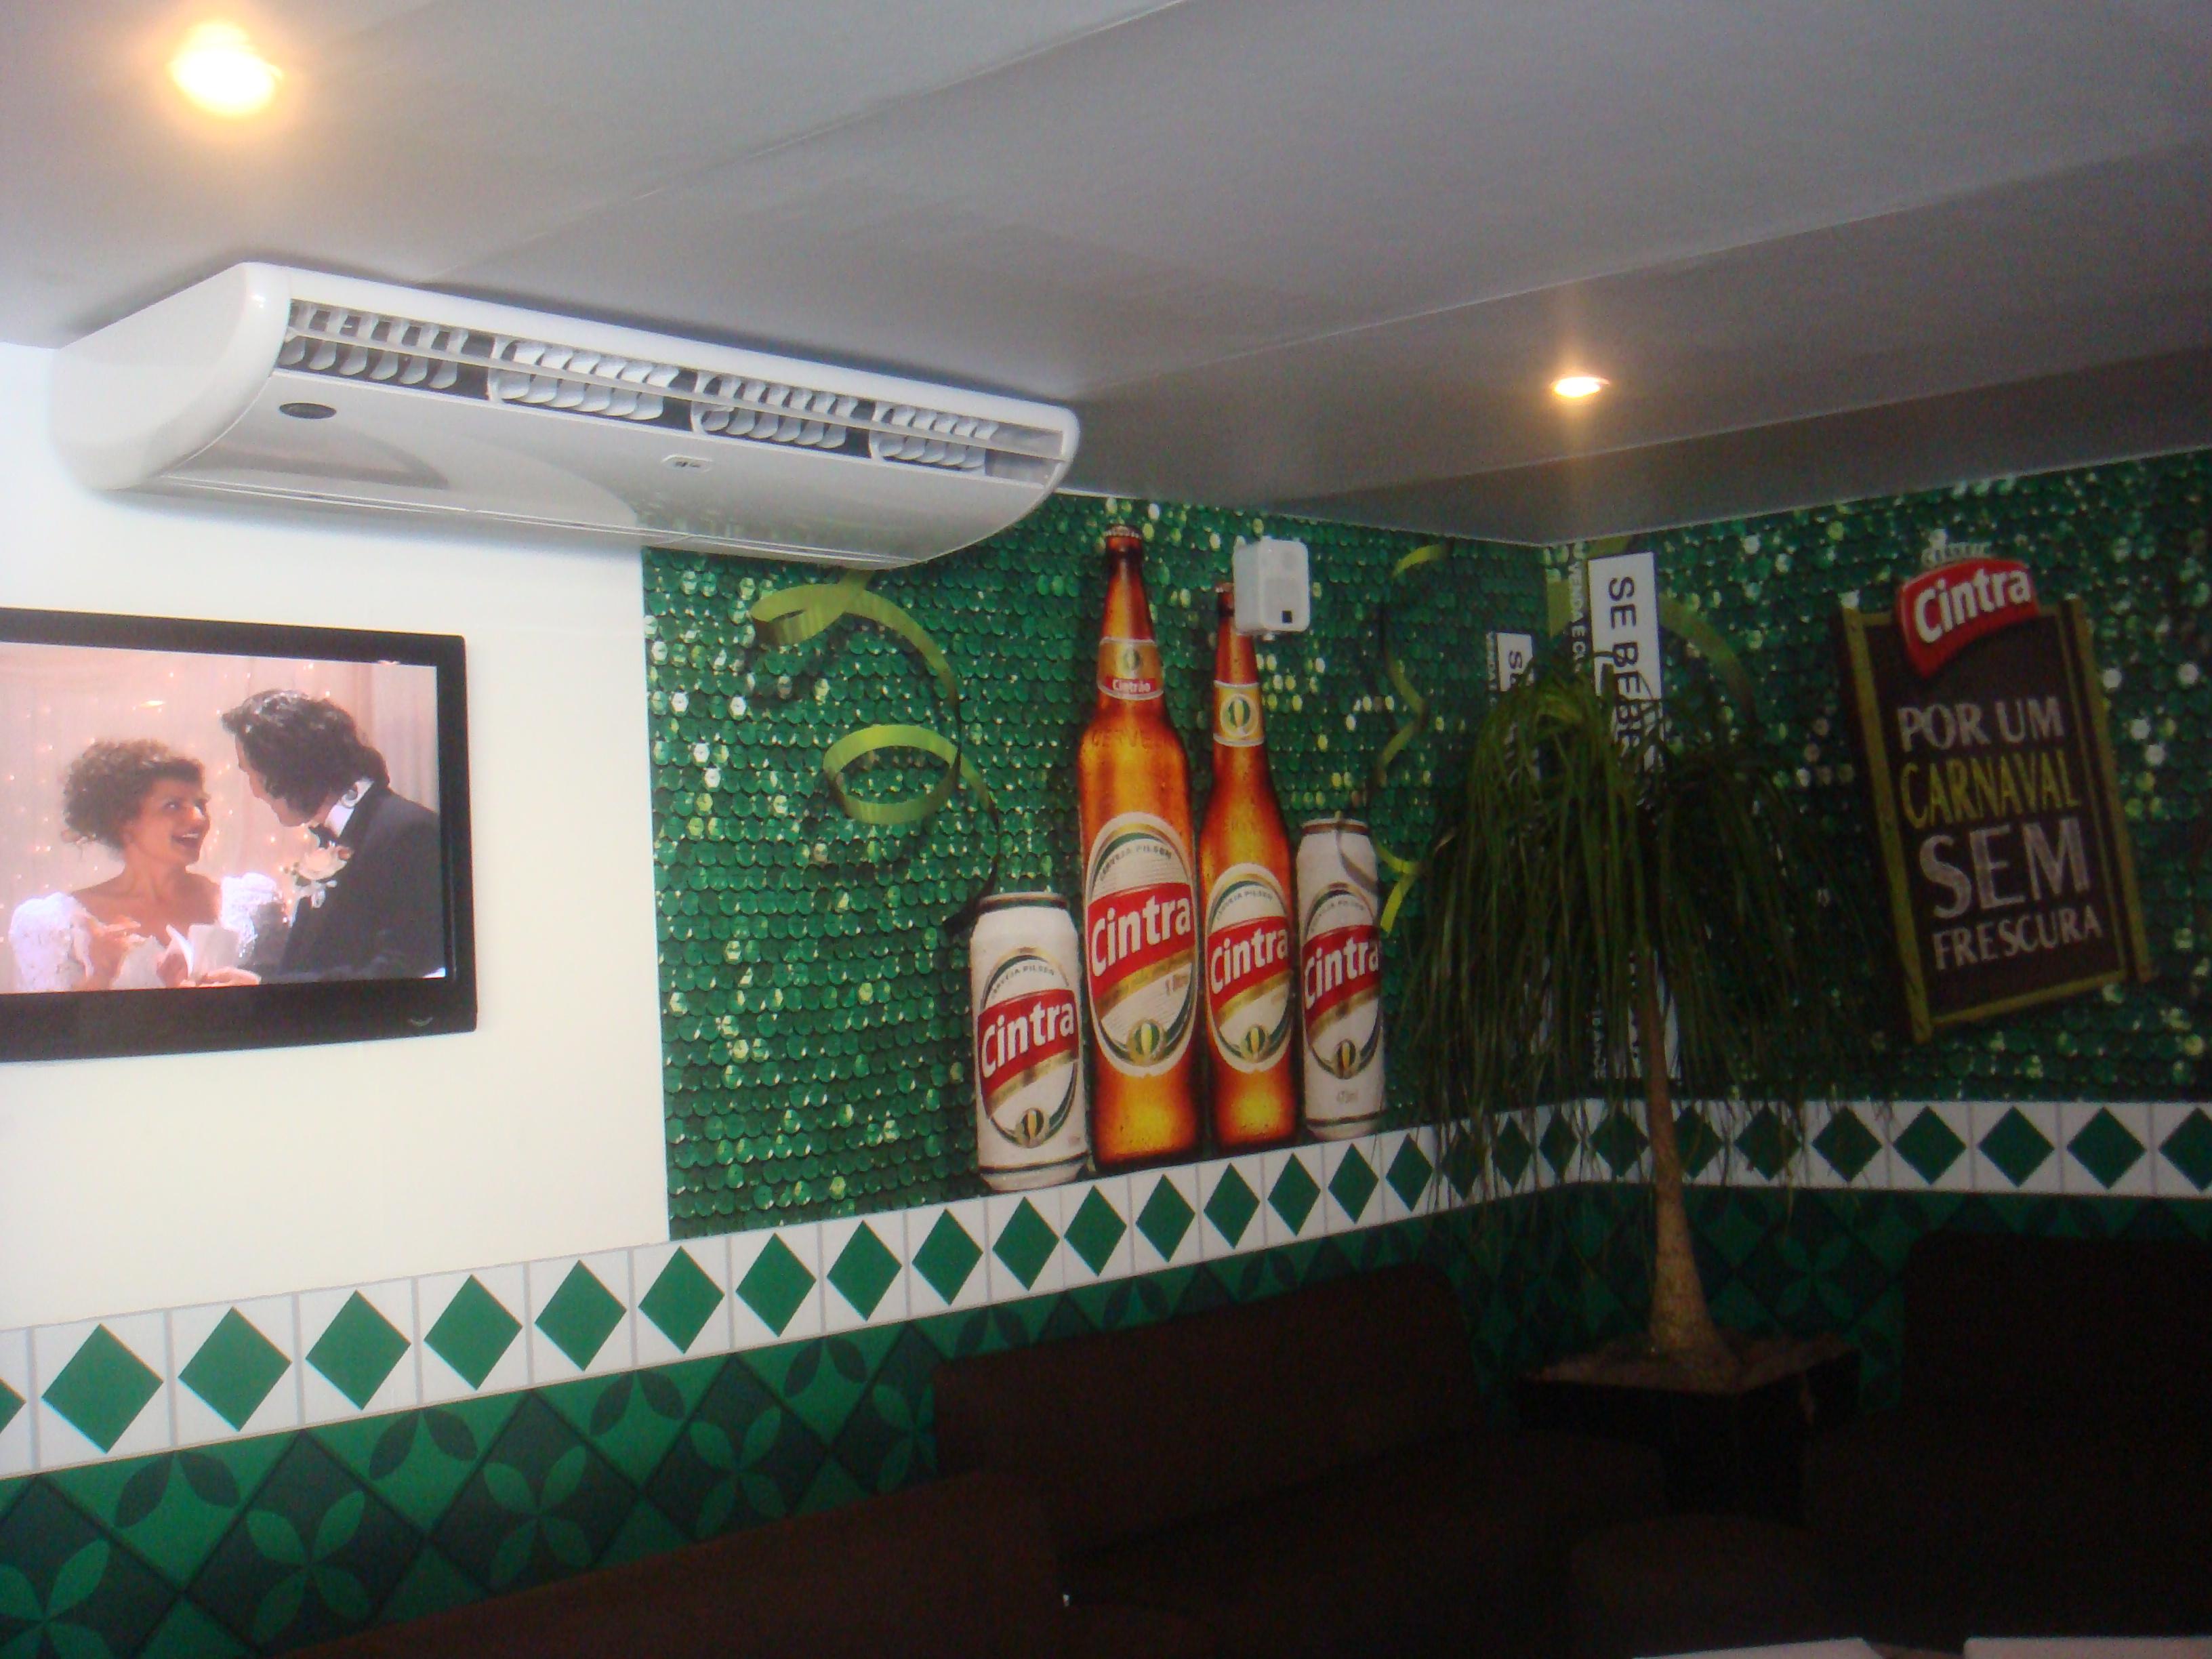 CARNAVAL 2010..